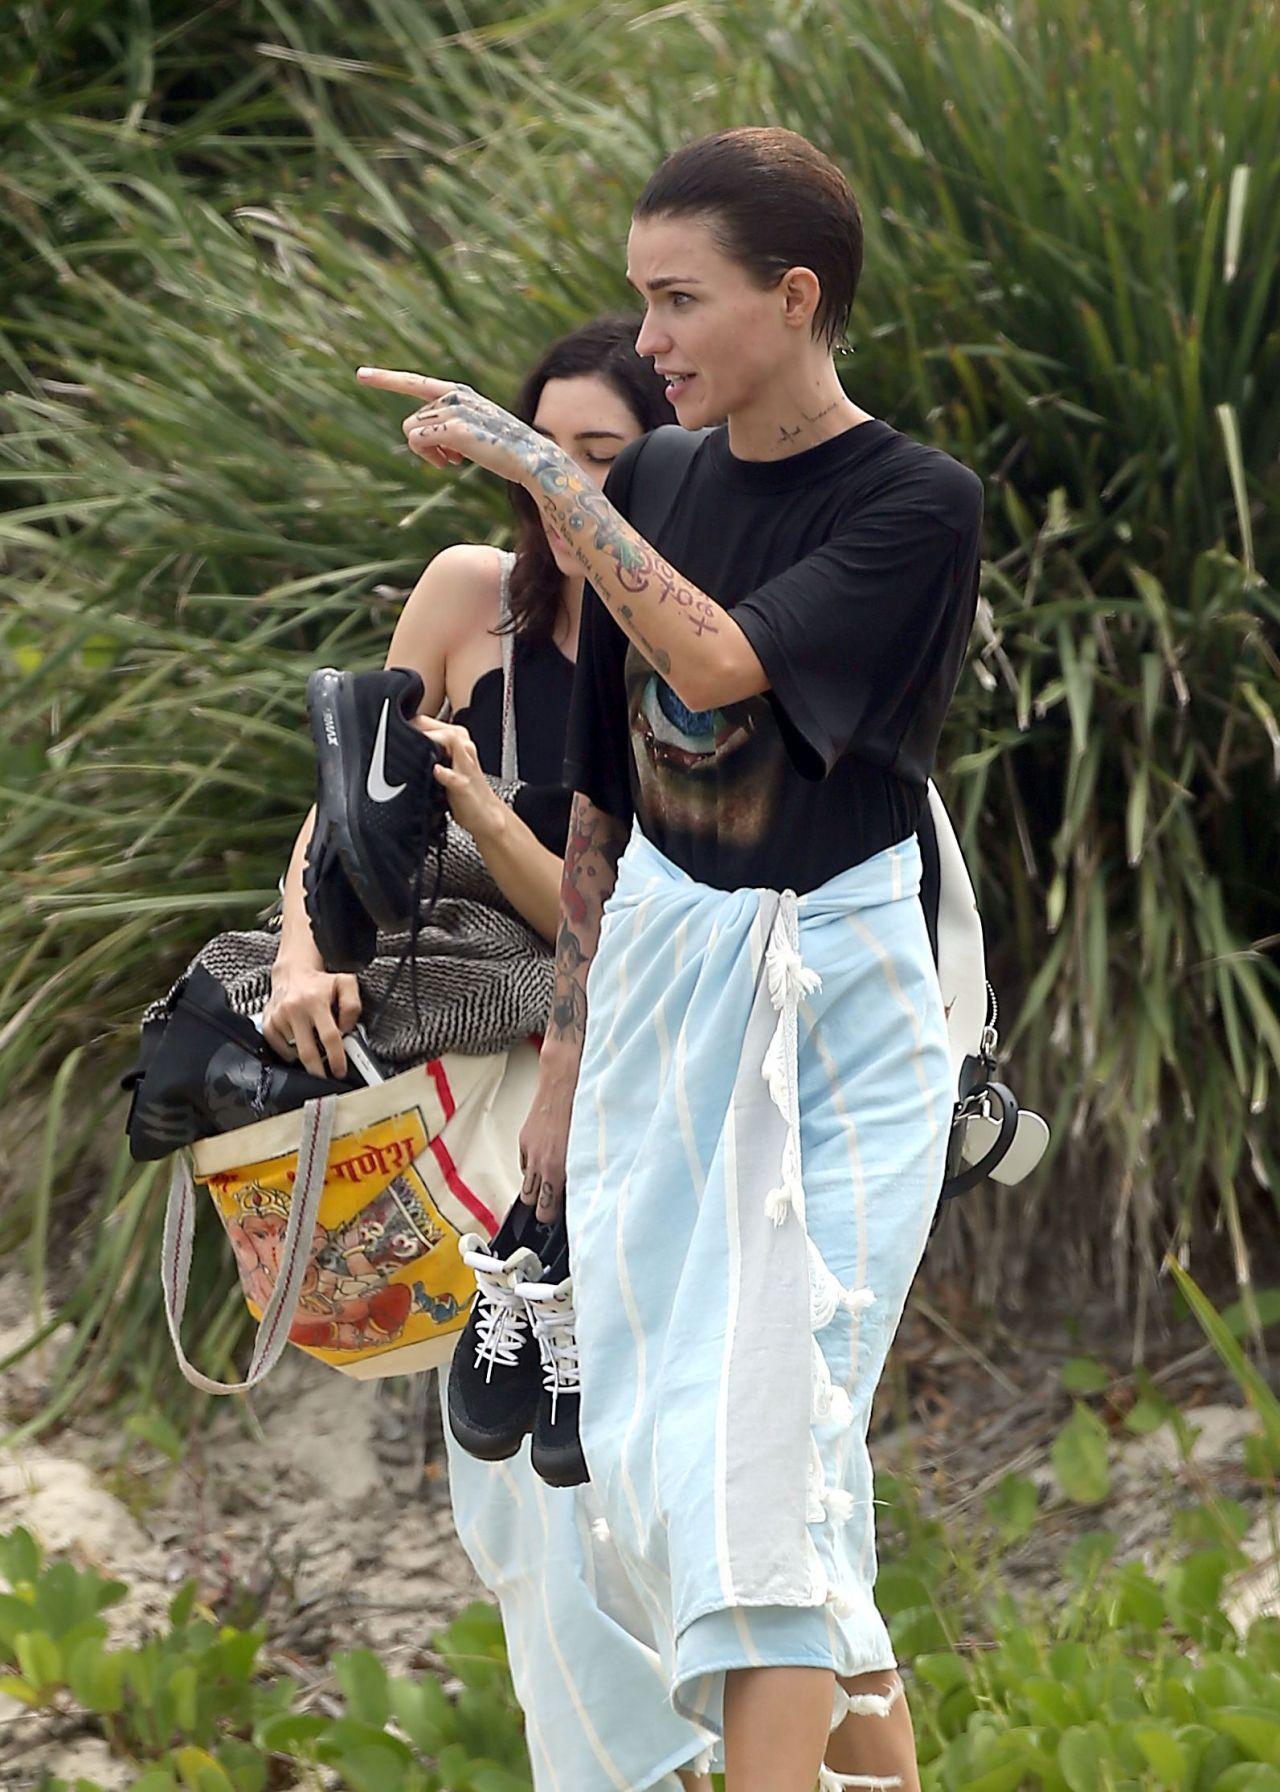 Ruby Rose With Girlfriend Jessica Origliasso Byron Bay Australia